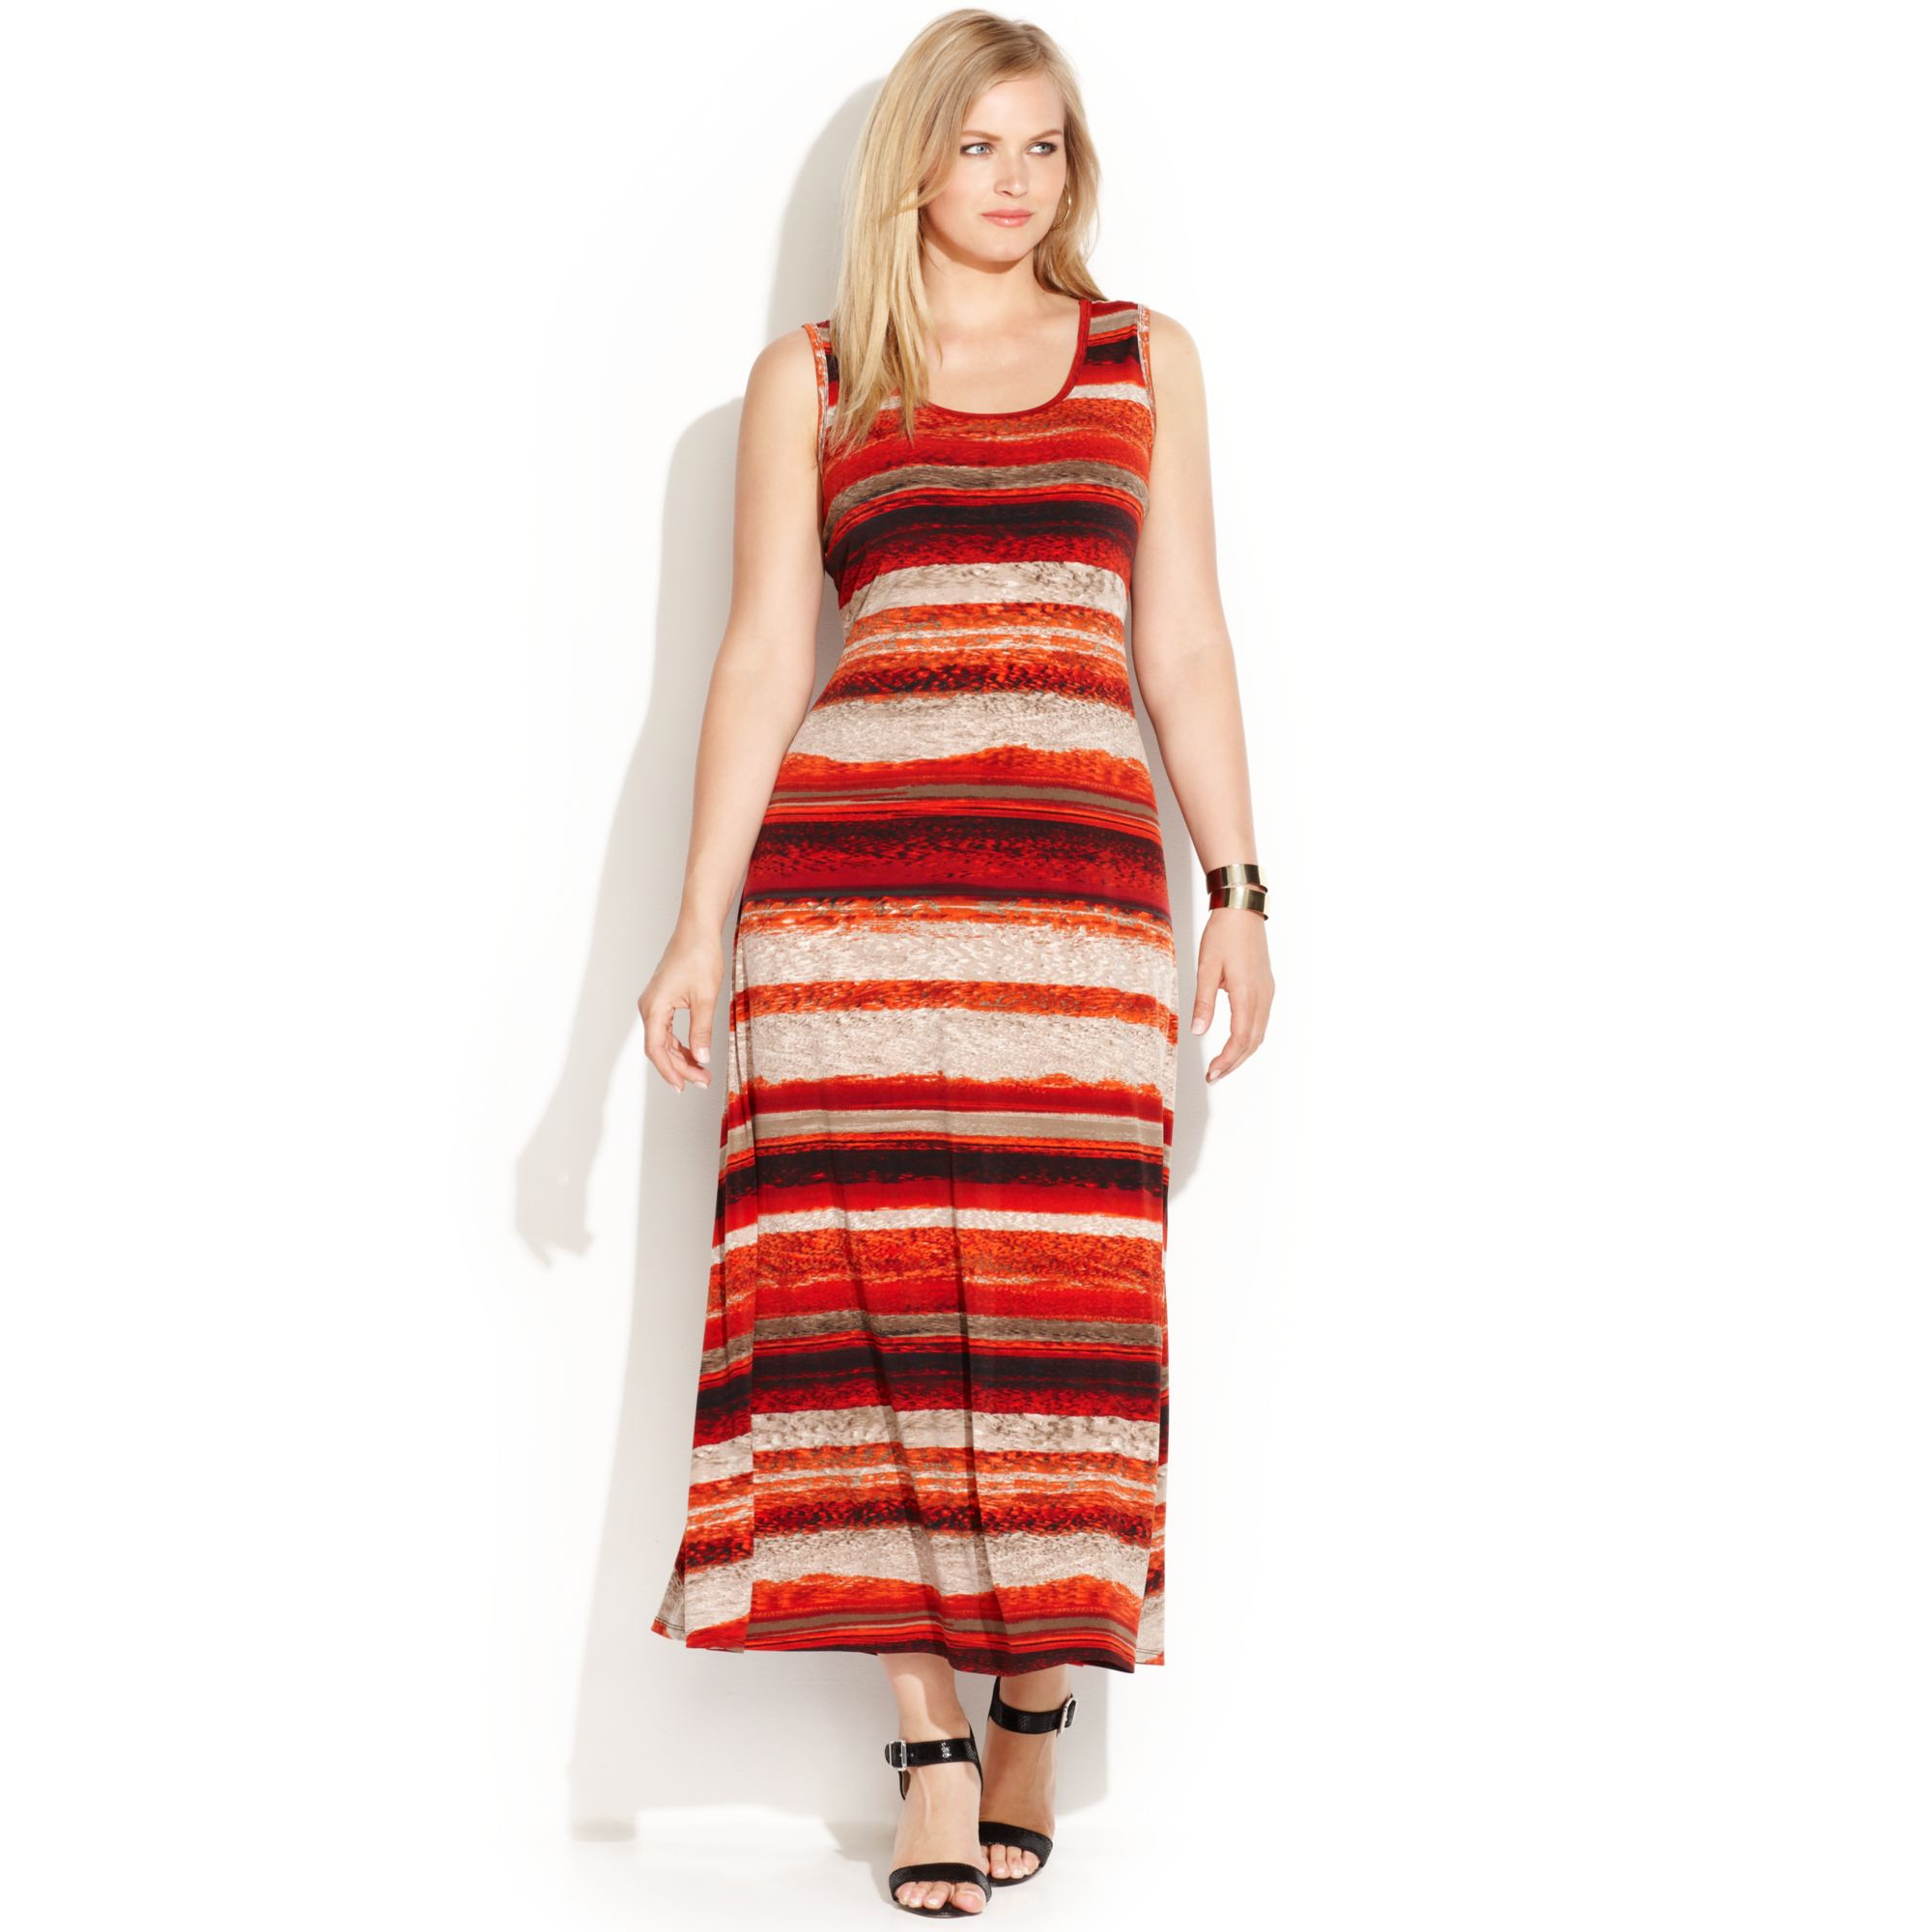 Plus Size Maxi Dresses At Macys